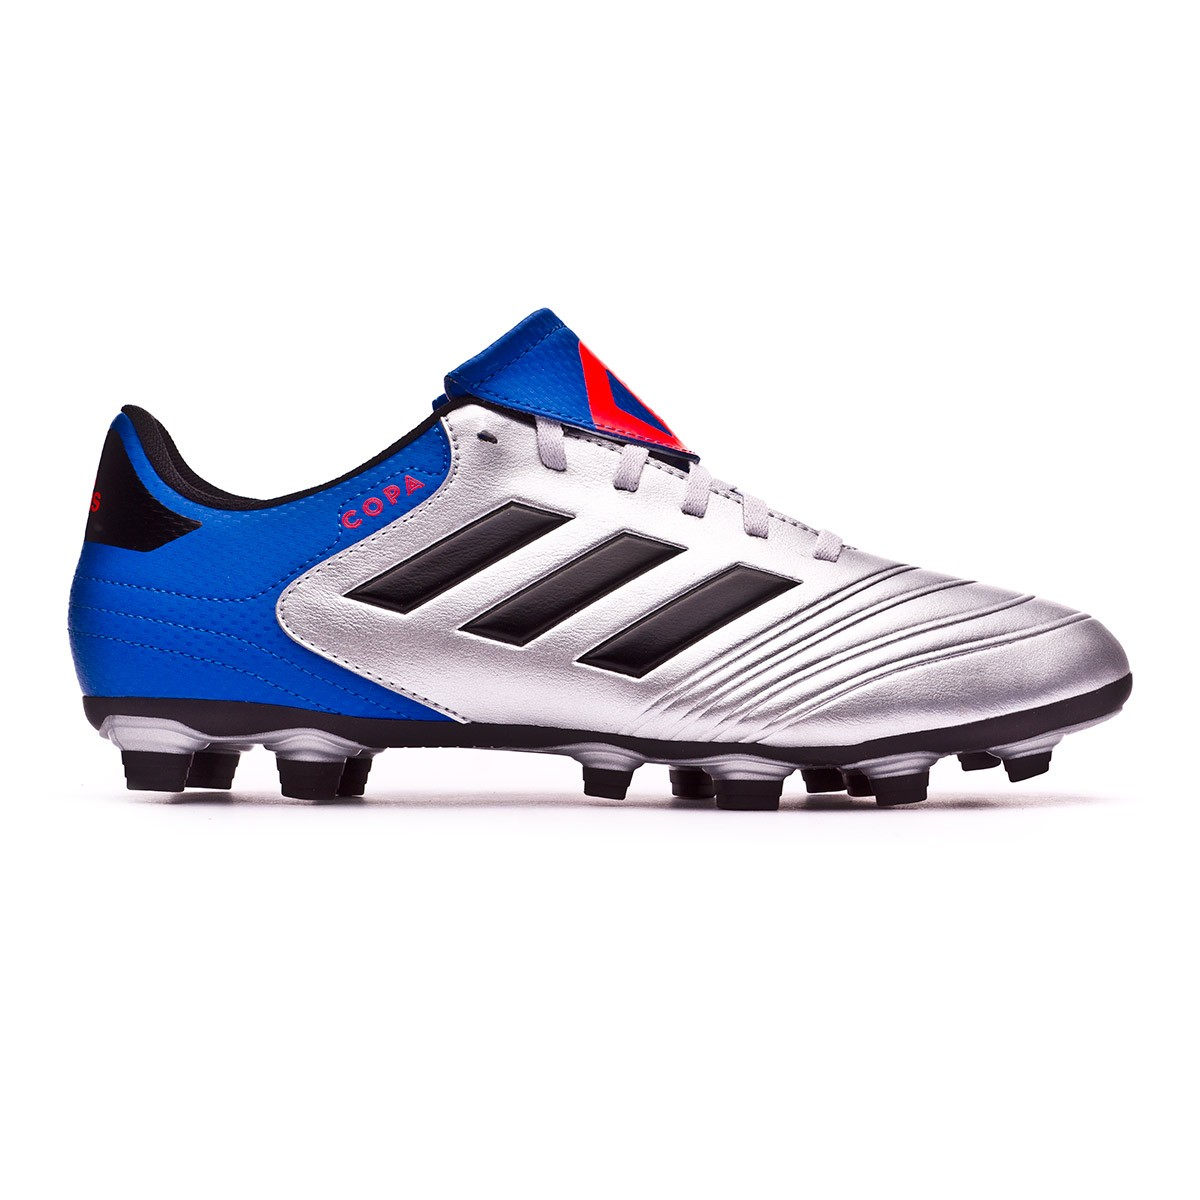 252e7191baed7 Boot adidas Copa 18.4 FxG Silver metallic-Core black-Football blue - Leaked  soccer